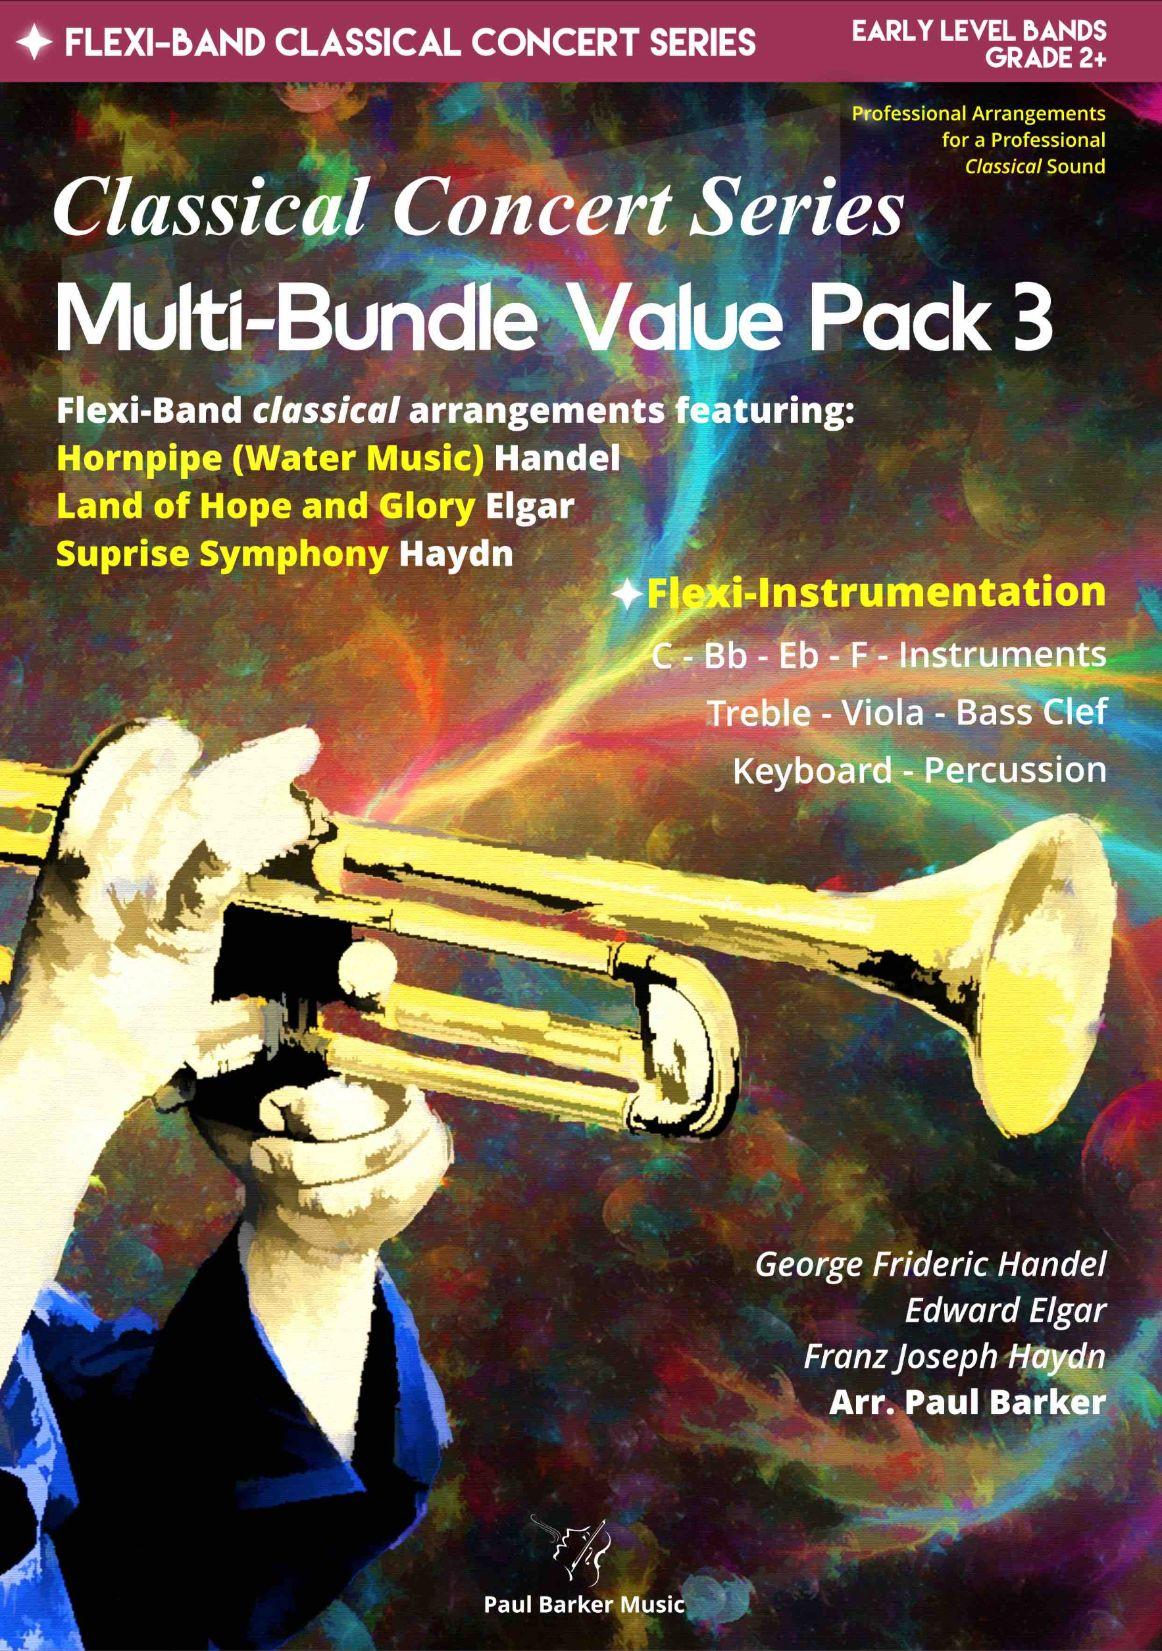 Flexi-Band Classical Concert Series Multi-Bundle Pack 3